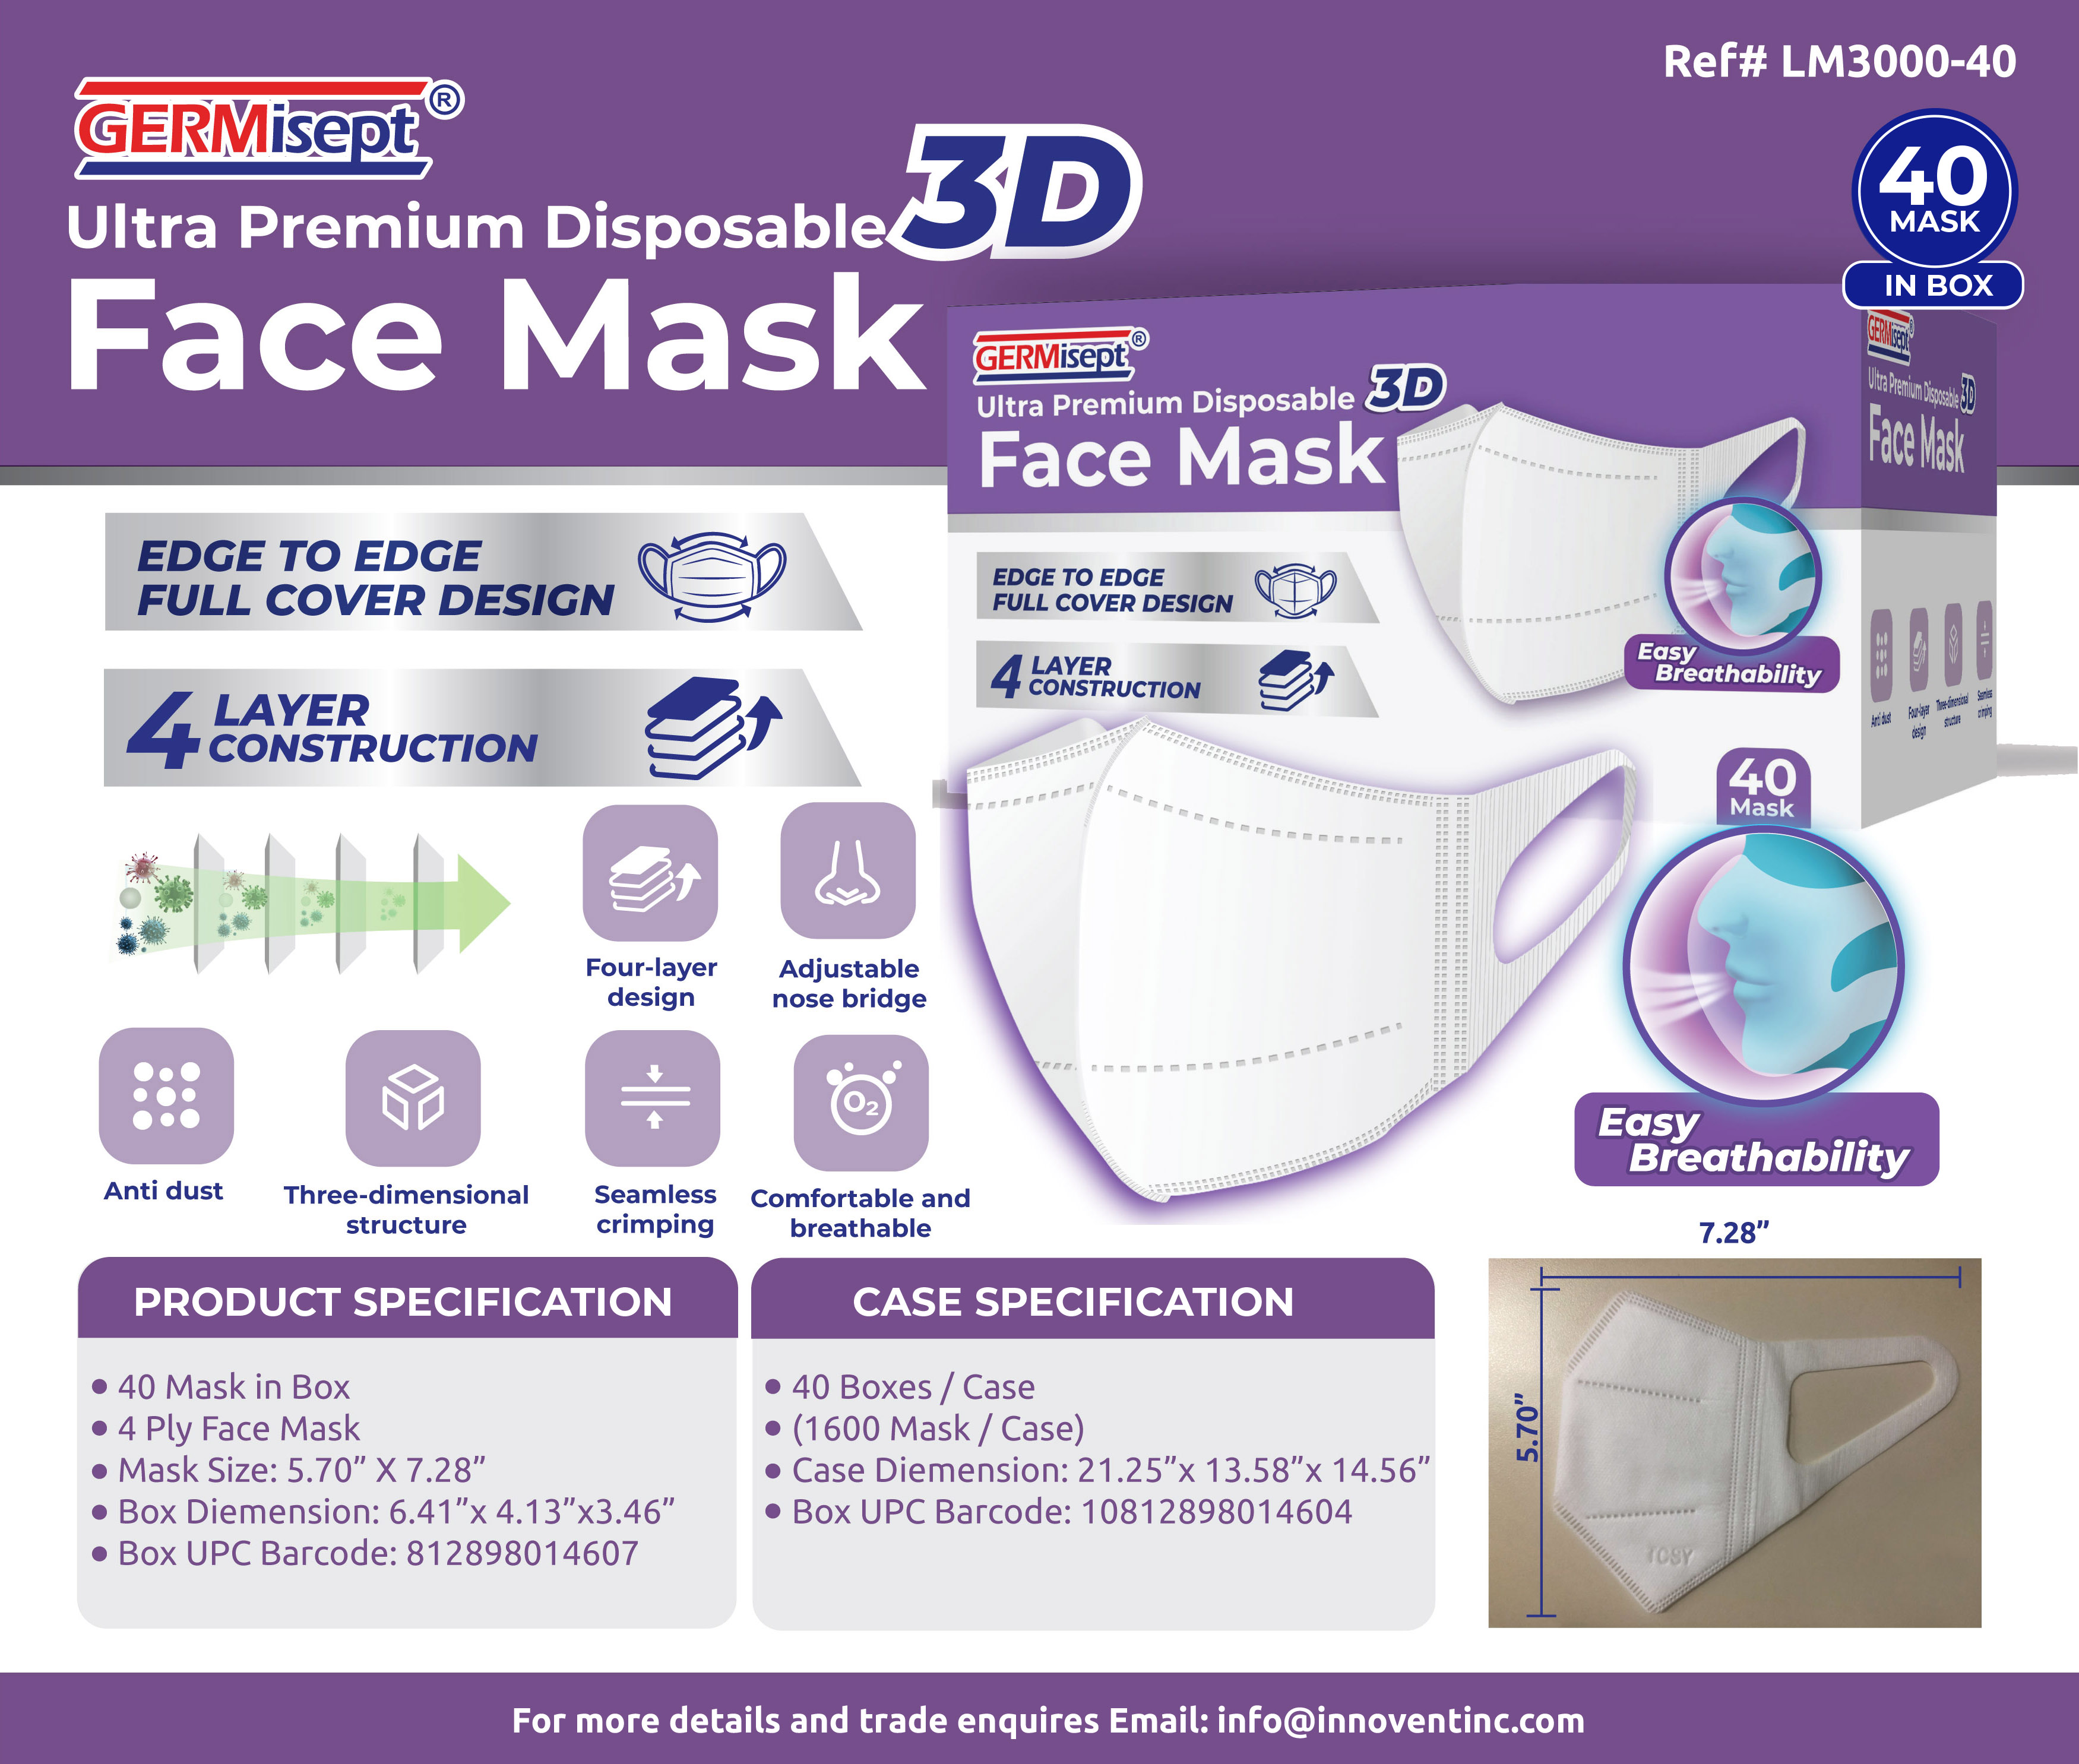 3D Mask -40 Count Offer